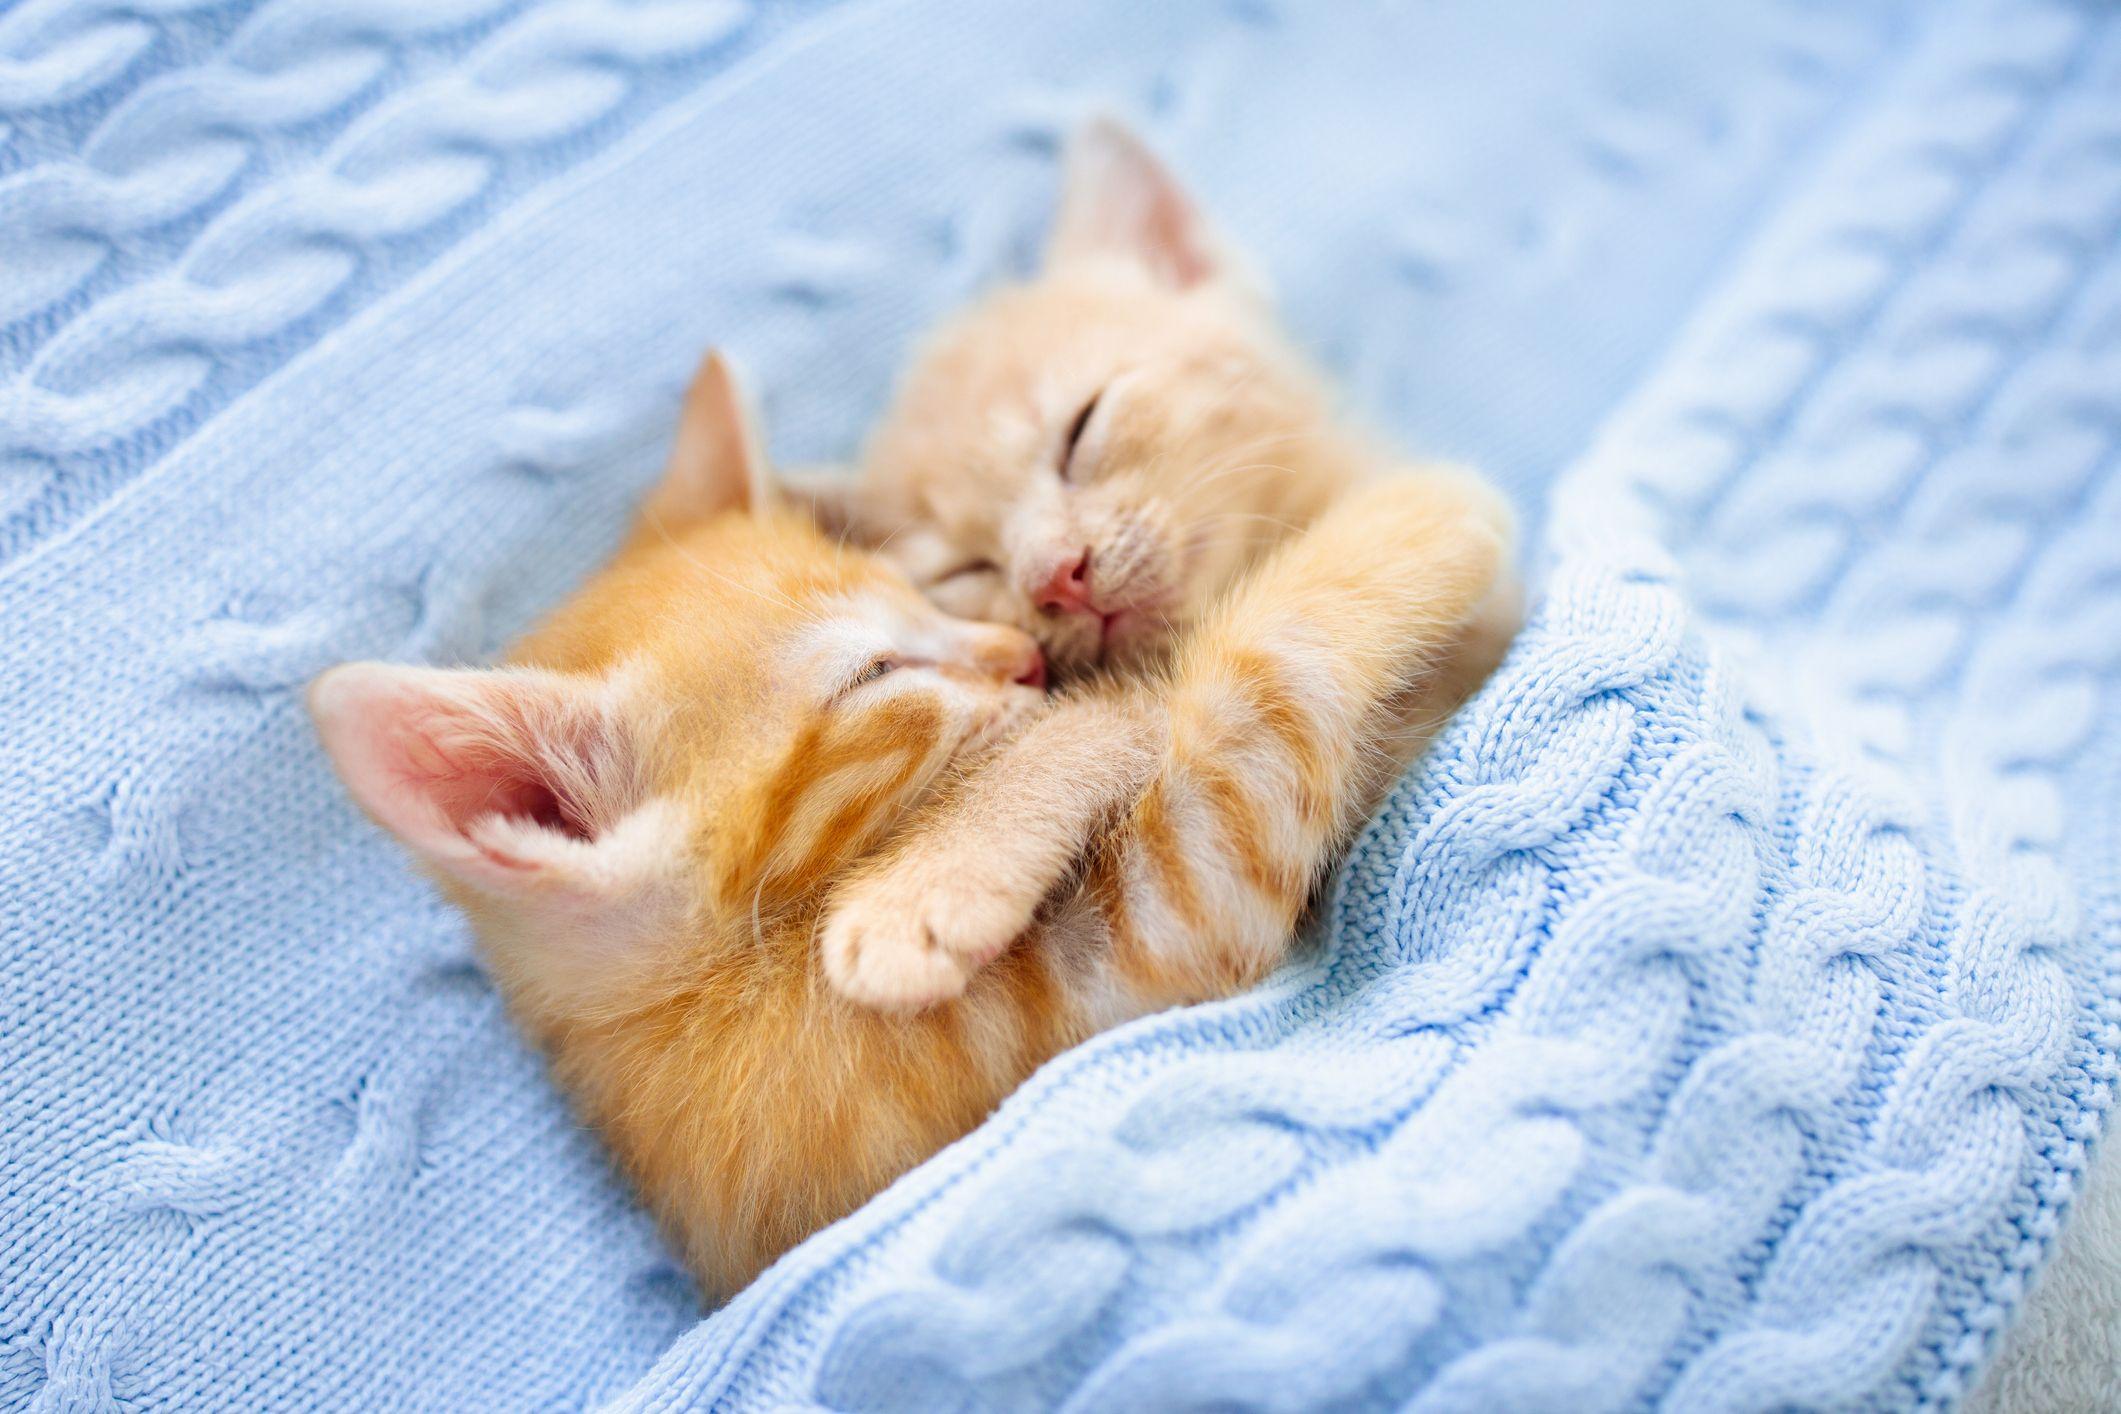 cute-photos-of-cats-cuddling-1593203046.jpg